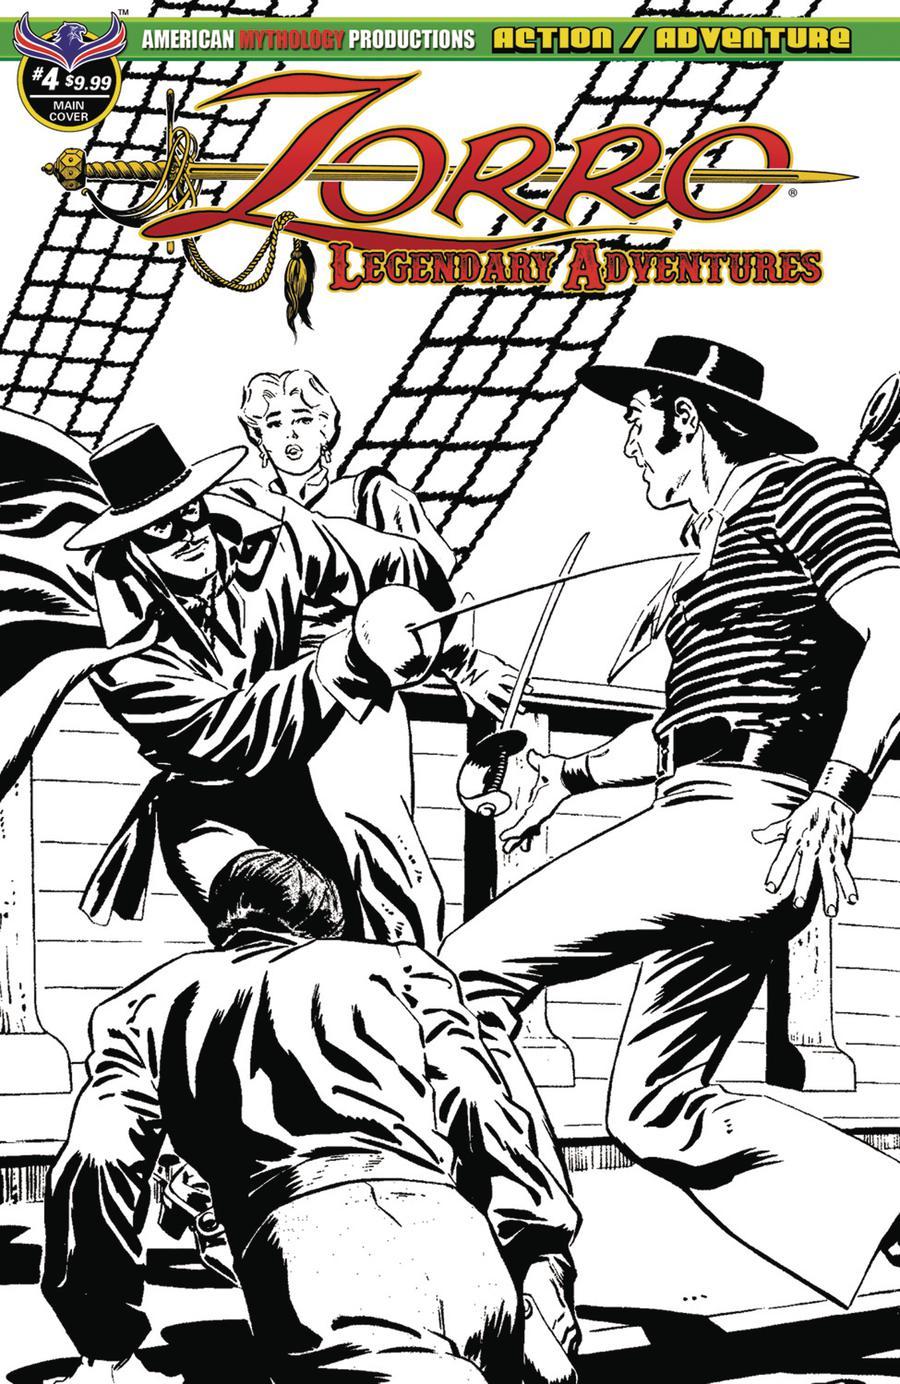 Zorro Legendary Adventures #4 Cover B Variant Francisco Cueto Blazing Blades Of Zorro Limited Edition Cover